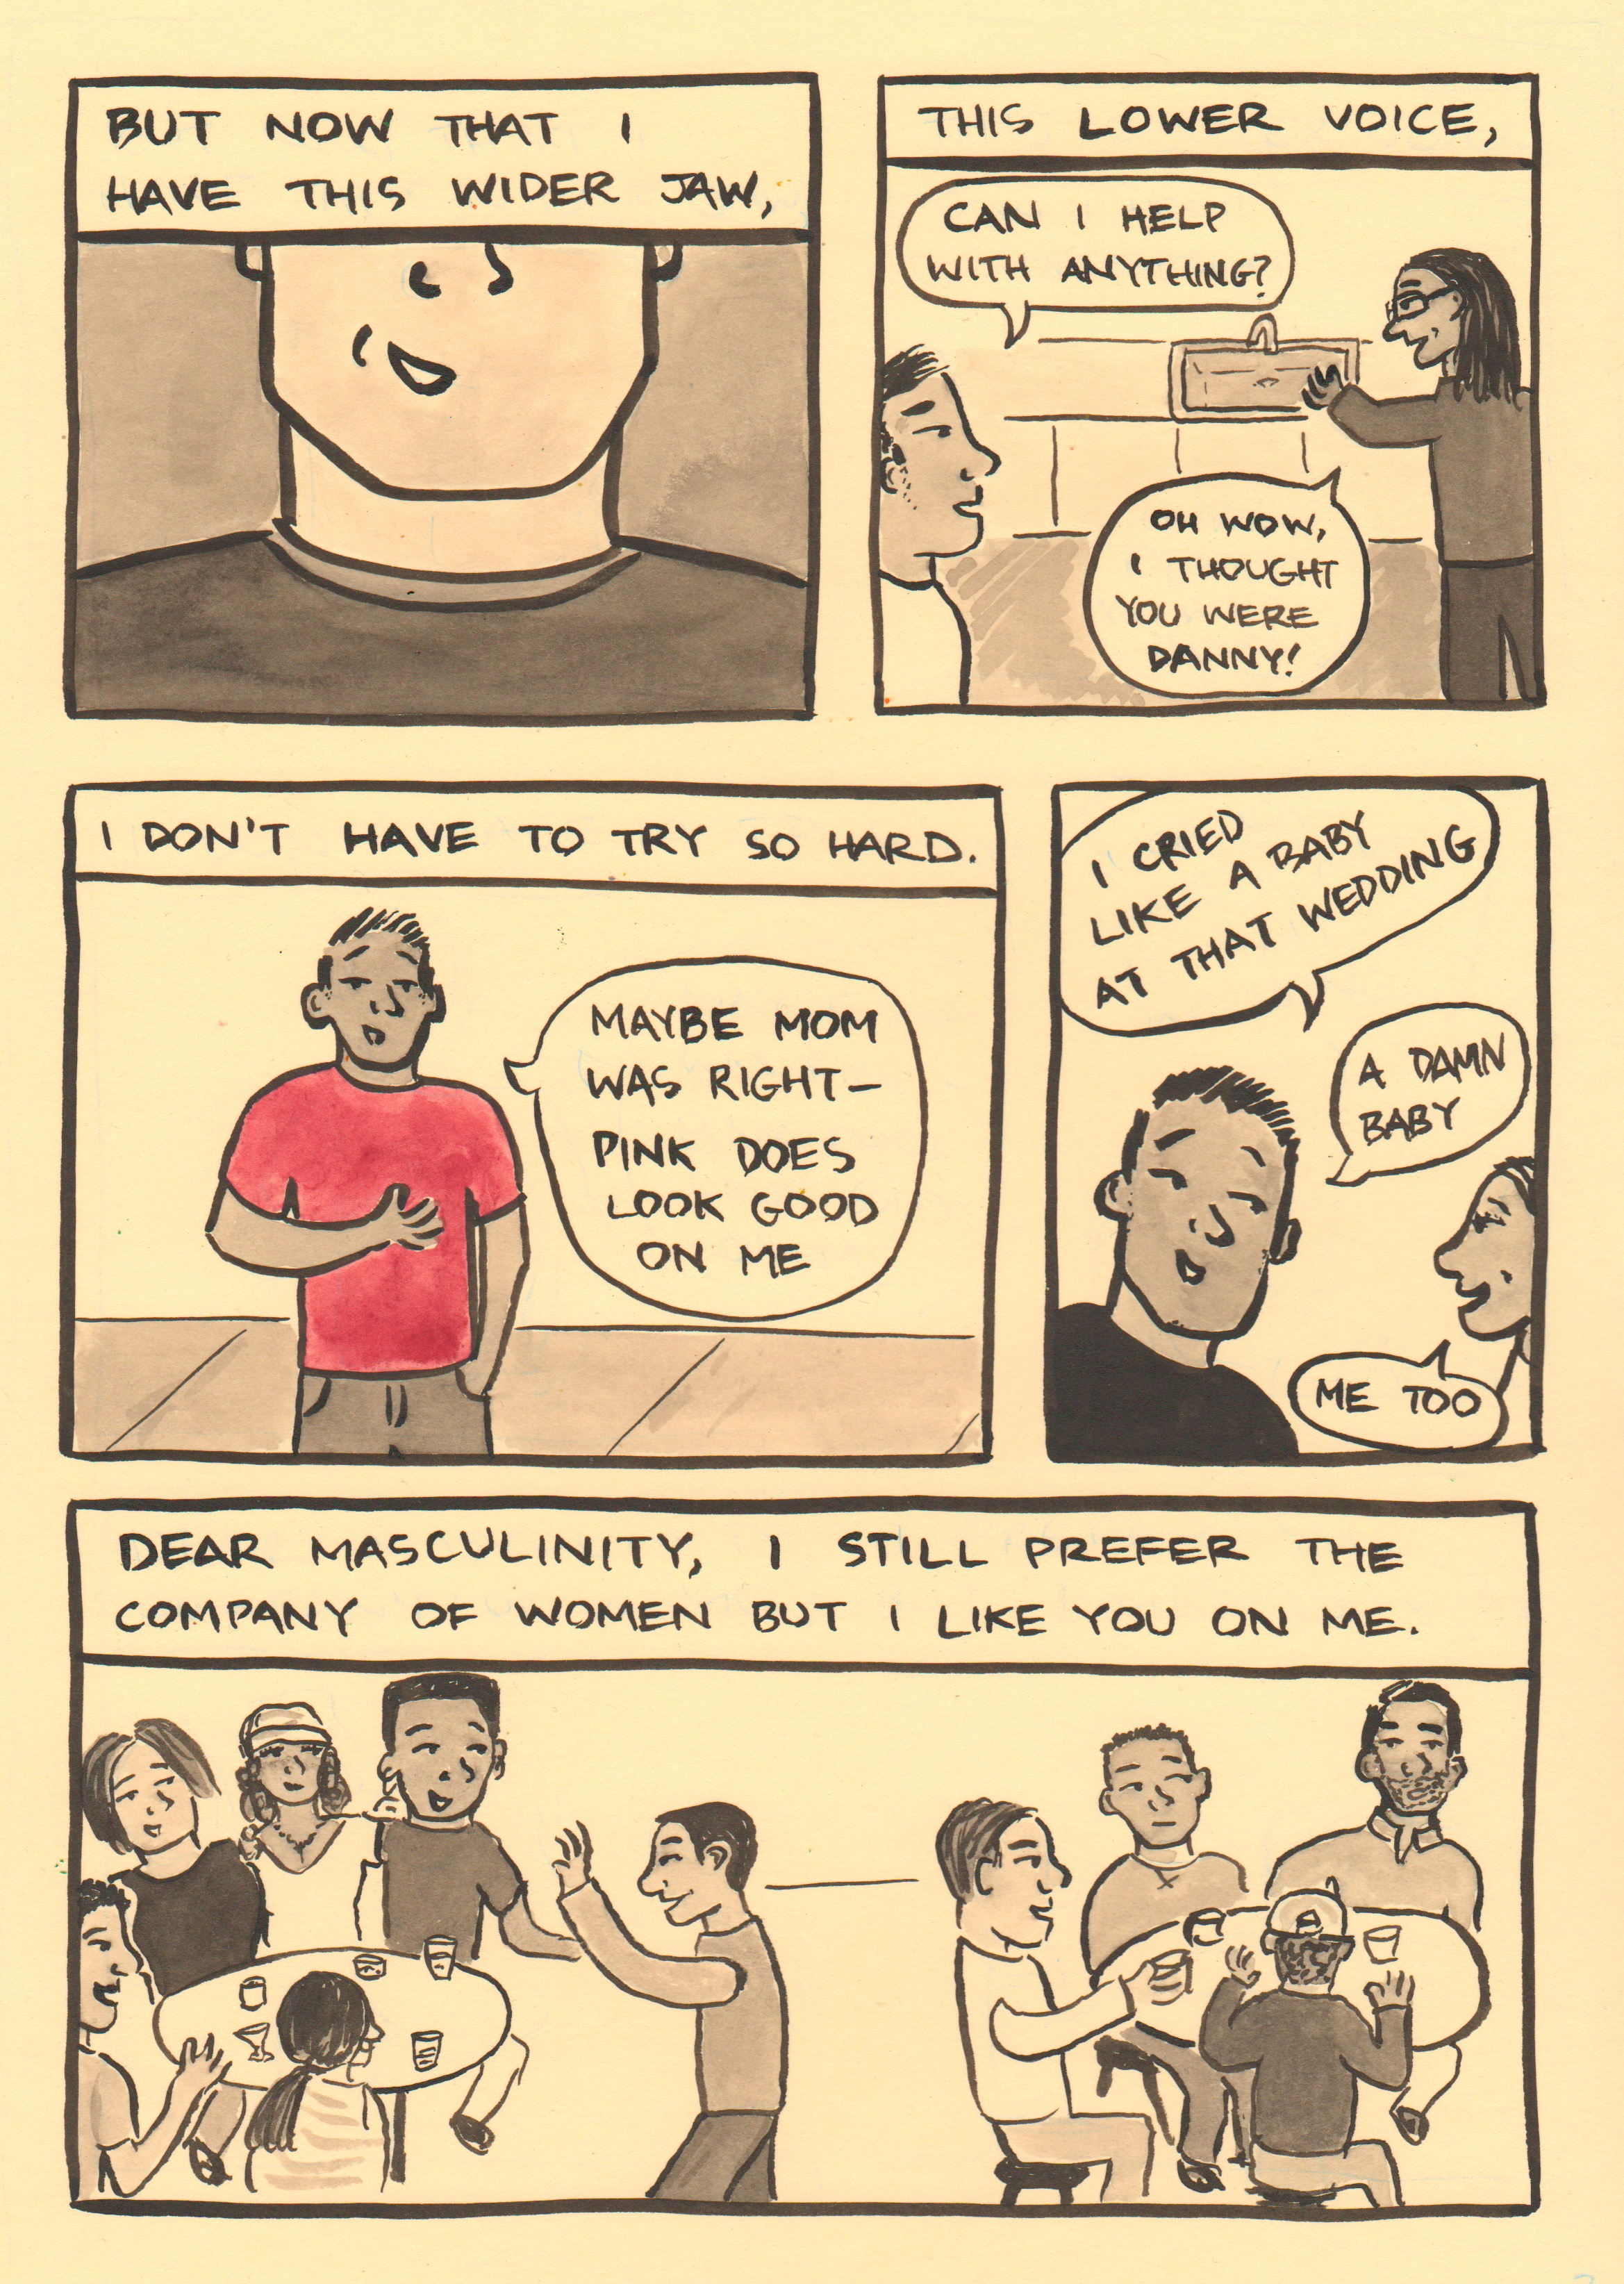 98 dear masculinity 2